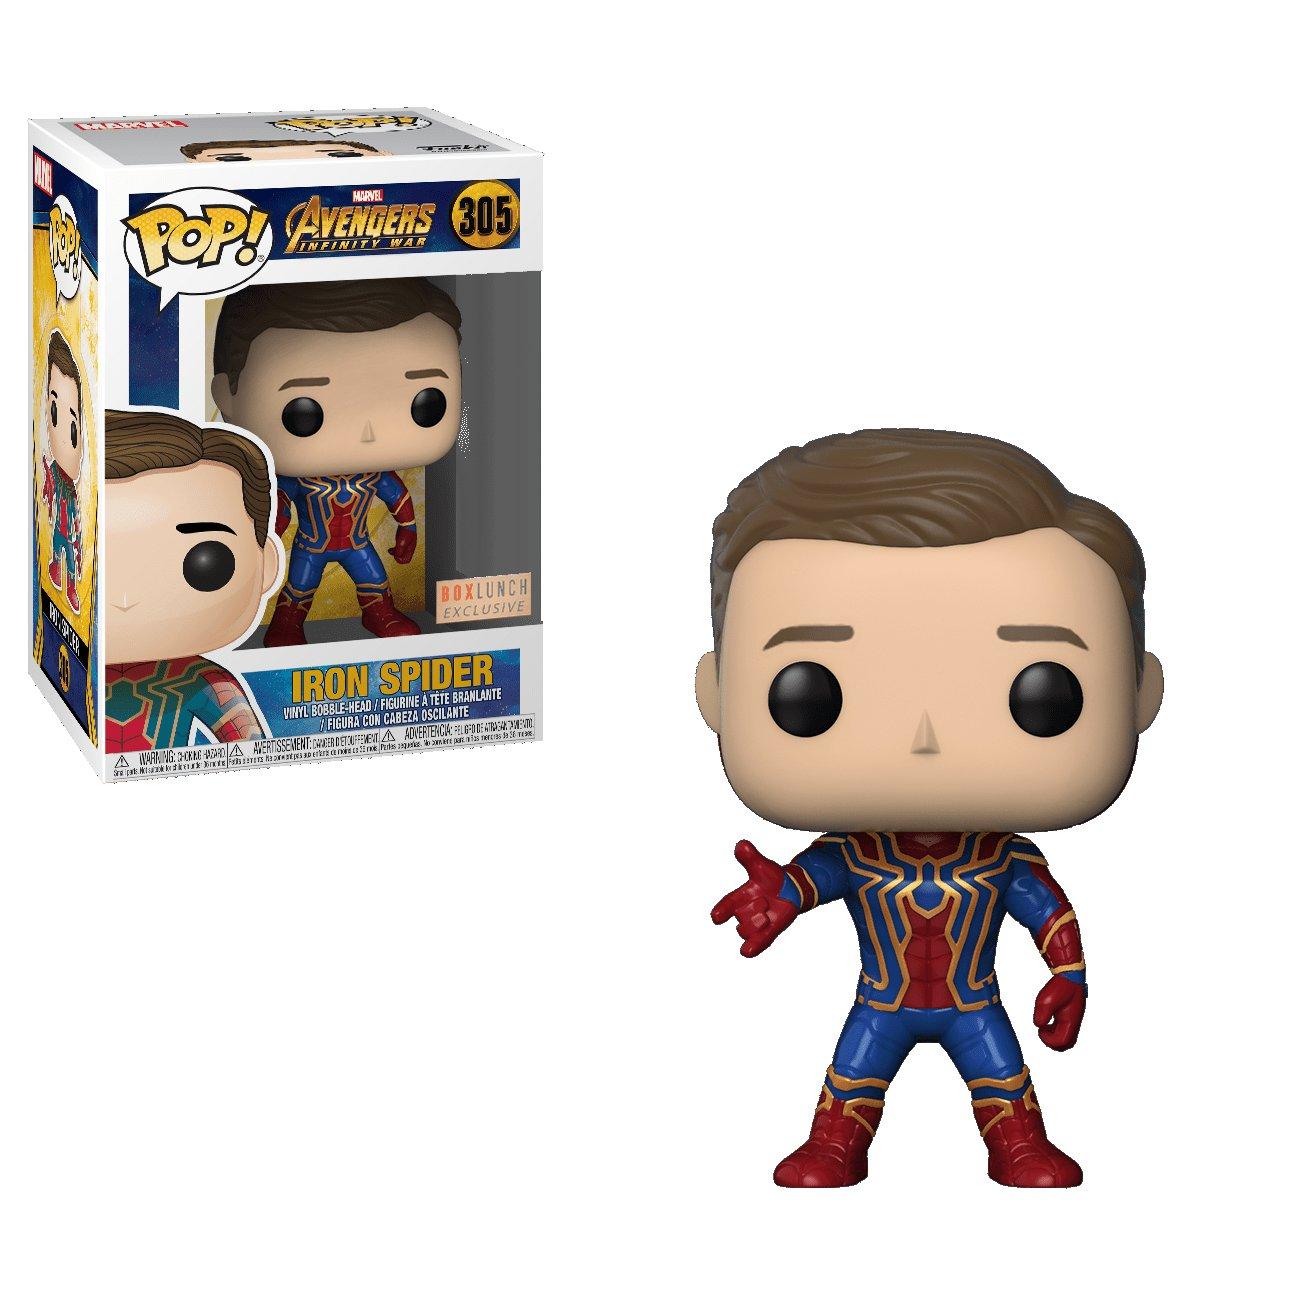 Iron Spider Unmasked Avengers Marvel Comics �305 Funko POP! Action Figure Vinyl PVC Minifigure Toy